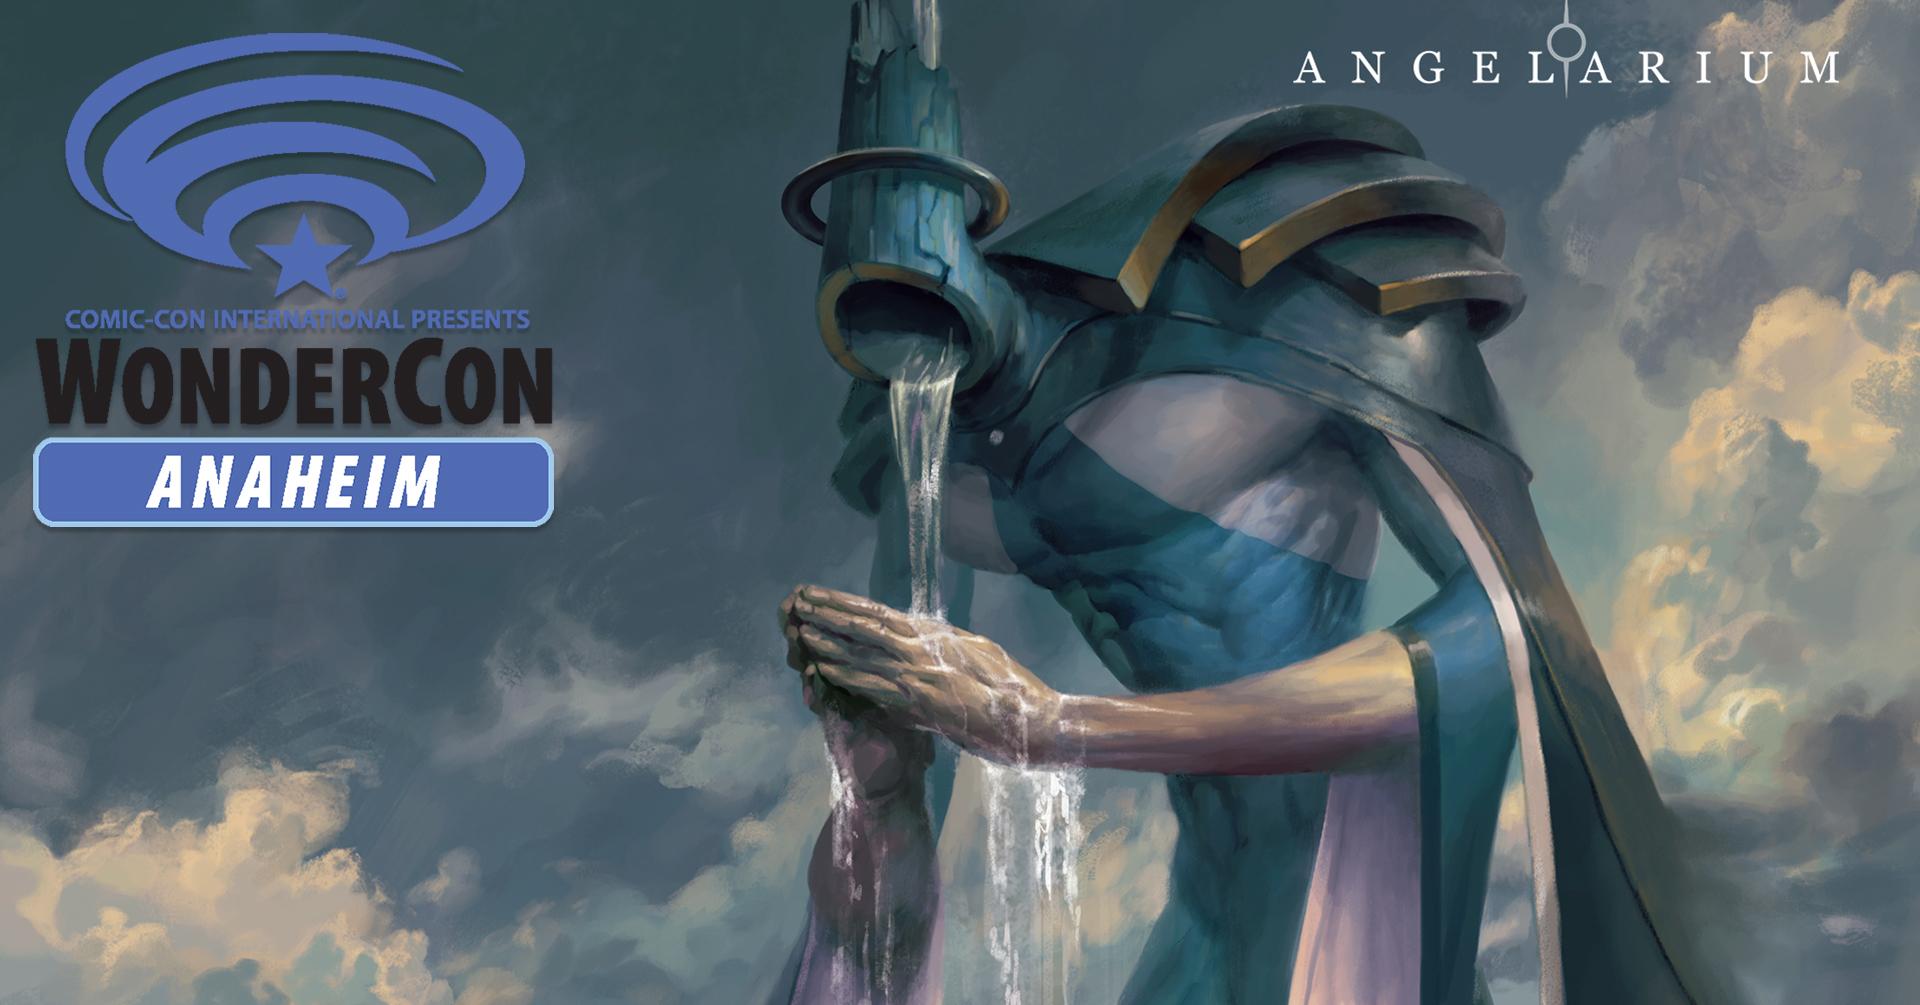 Event FB Cover WonderCon.jpg